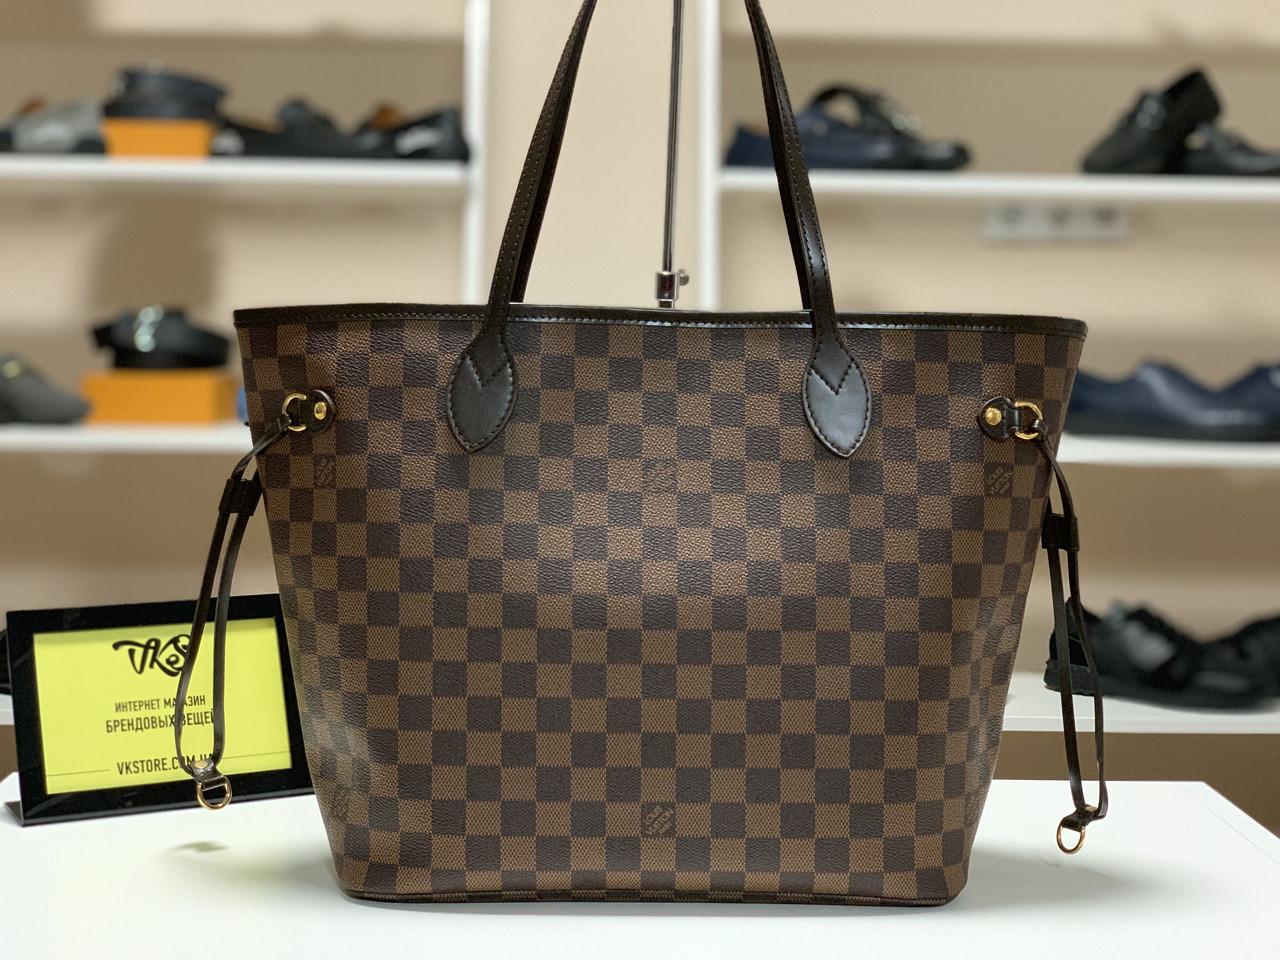 9abb8f7fce9a Louis Vuitton сумка Neverfull | vkstore.com.ua